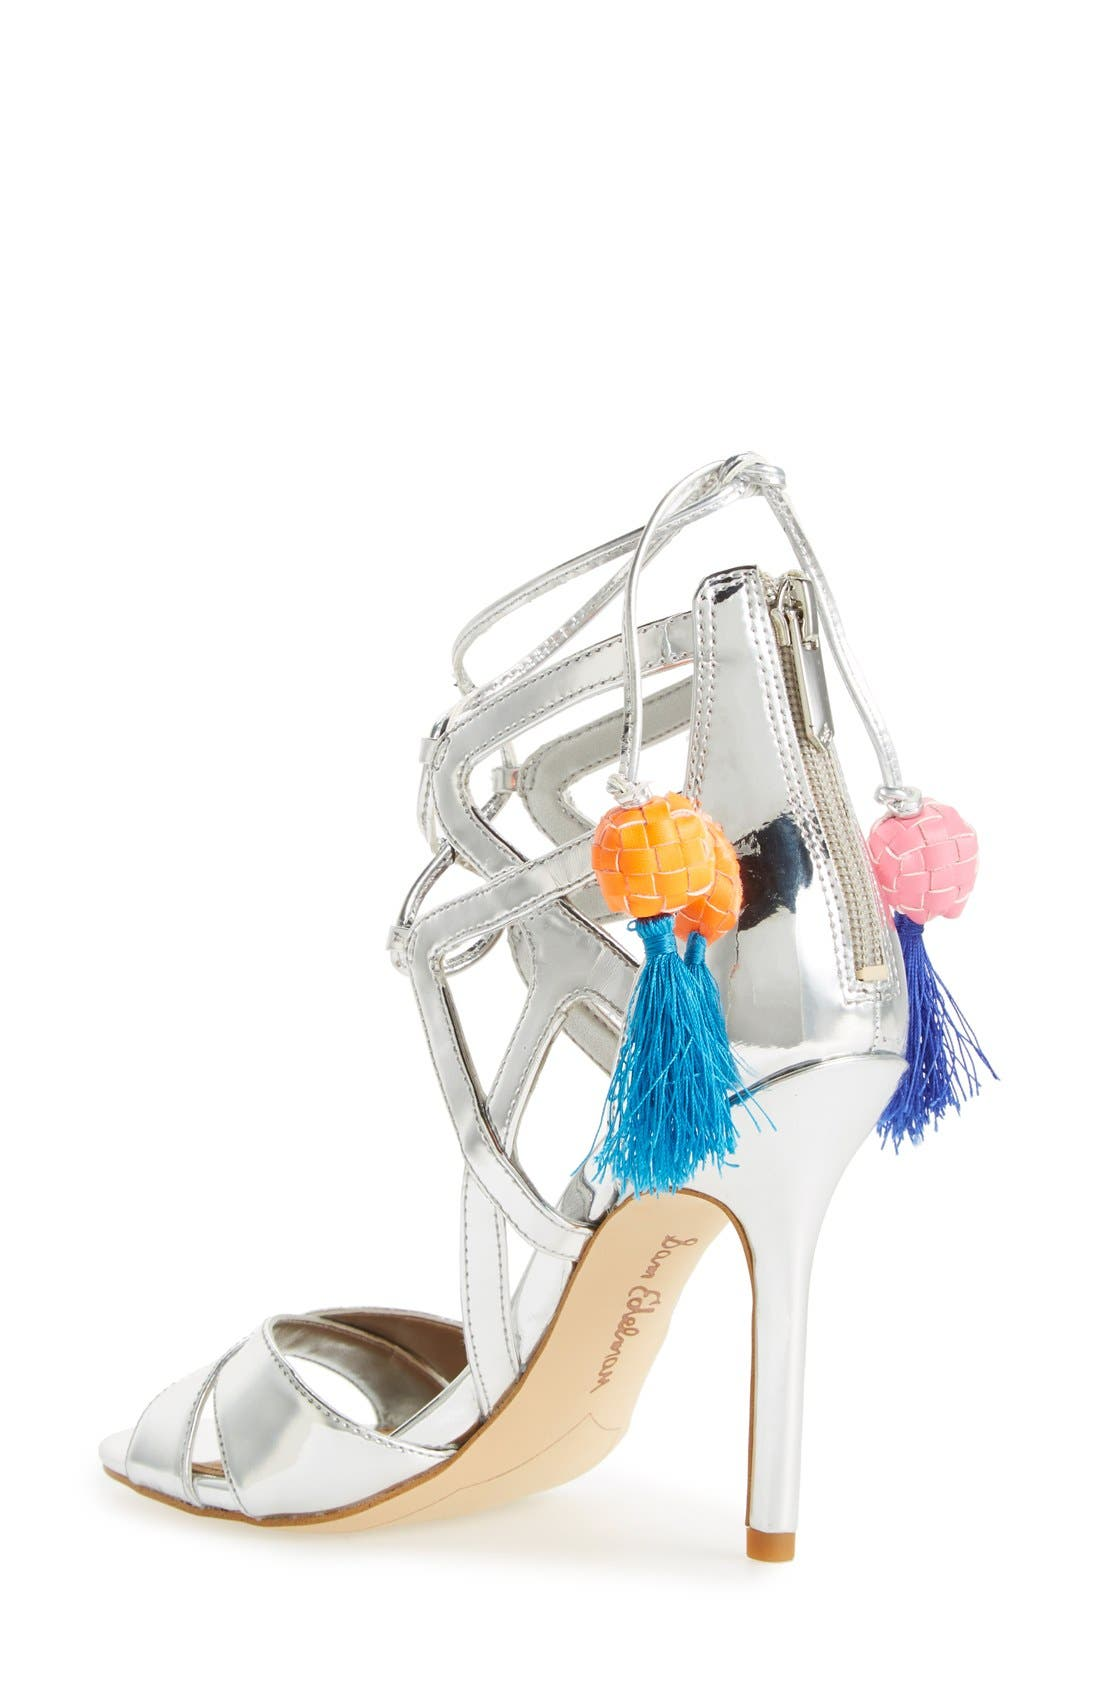 'Azela' Tassel Lace-Up Sandal,                             Alternate thumbnail 4, color,                             040